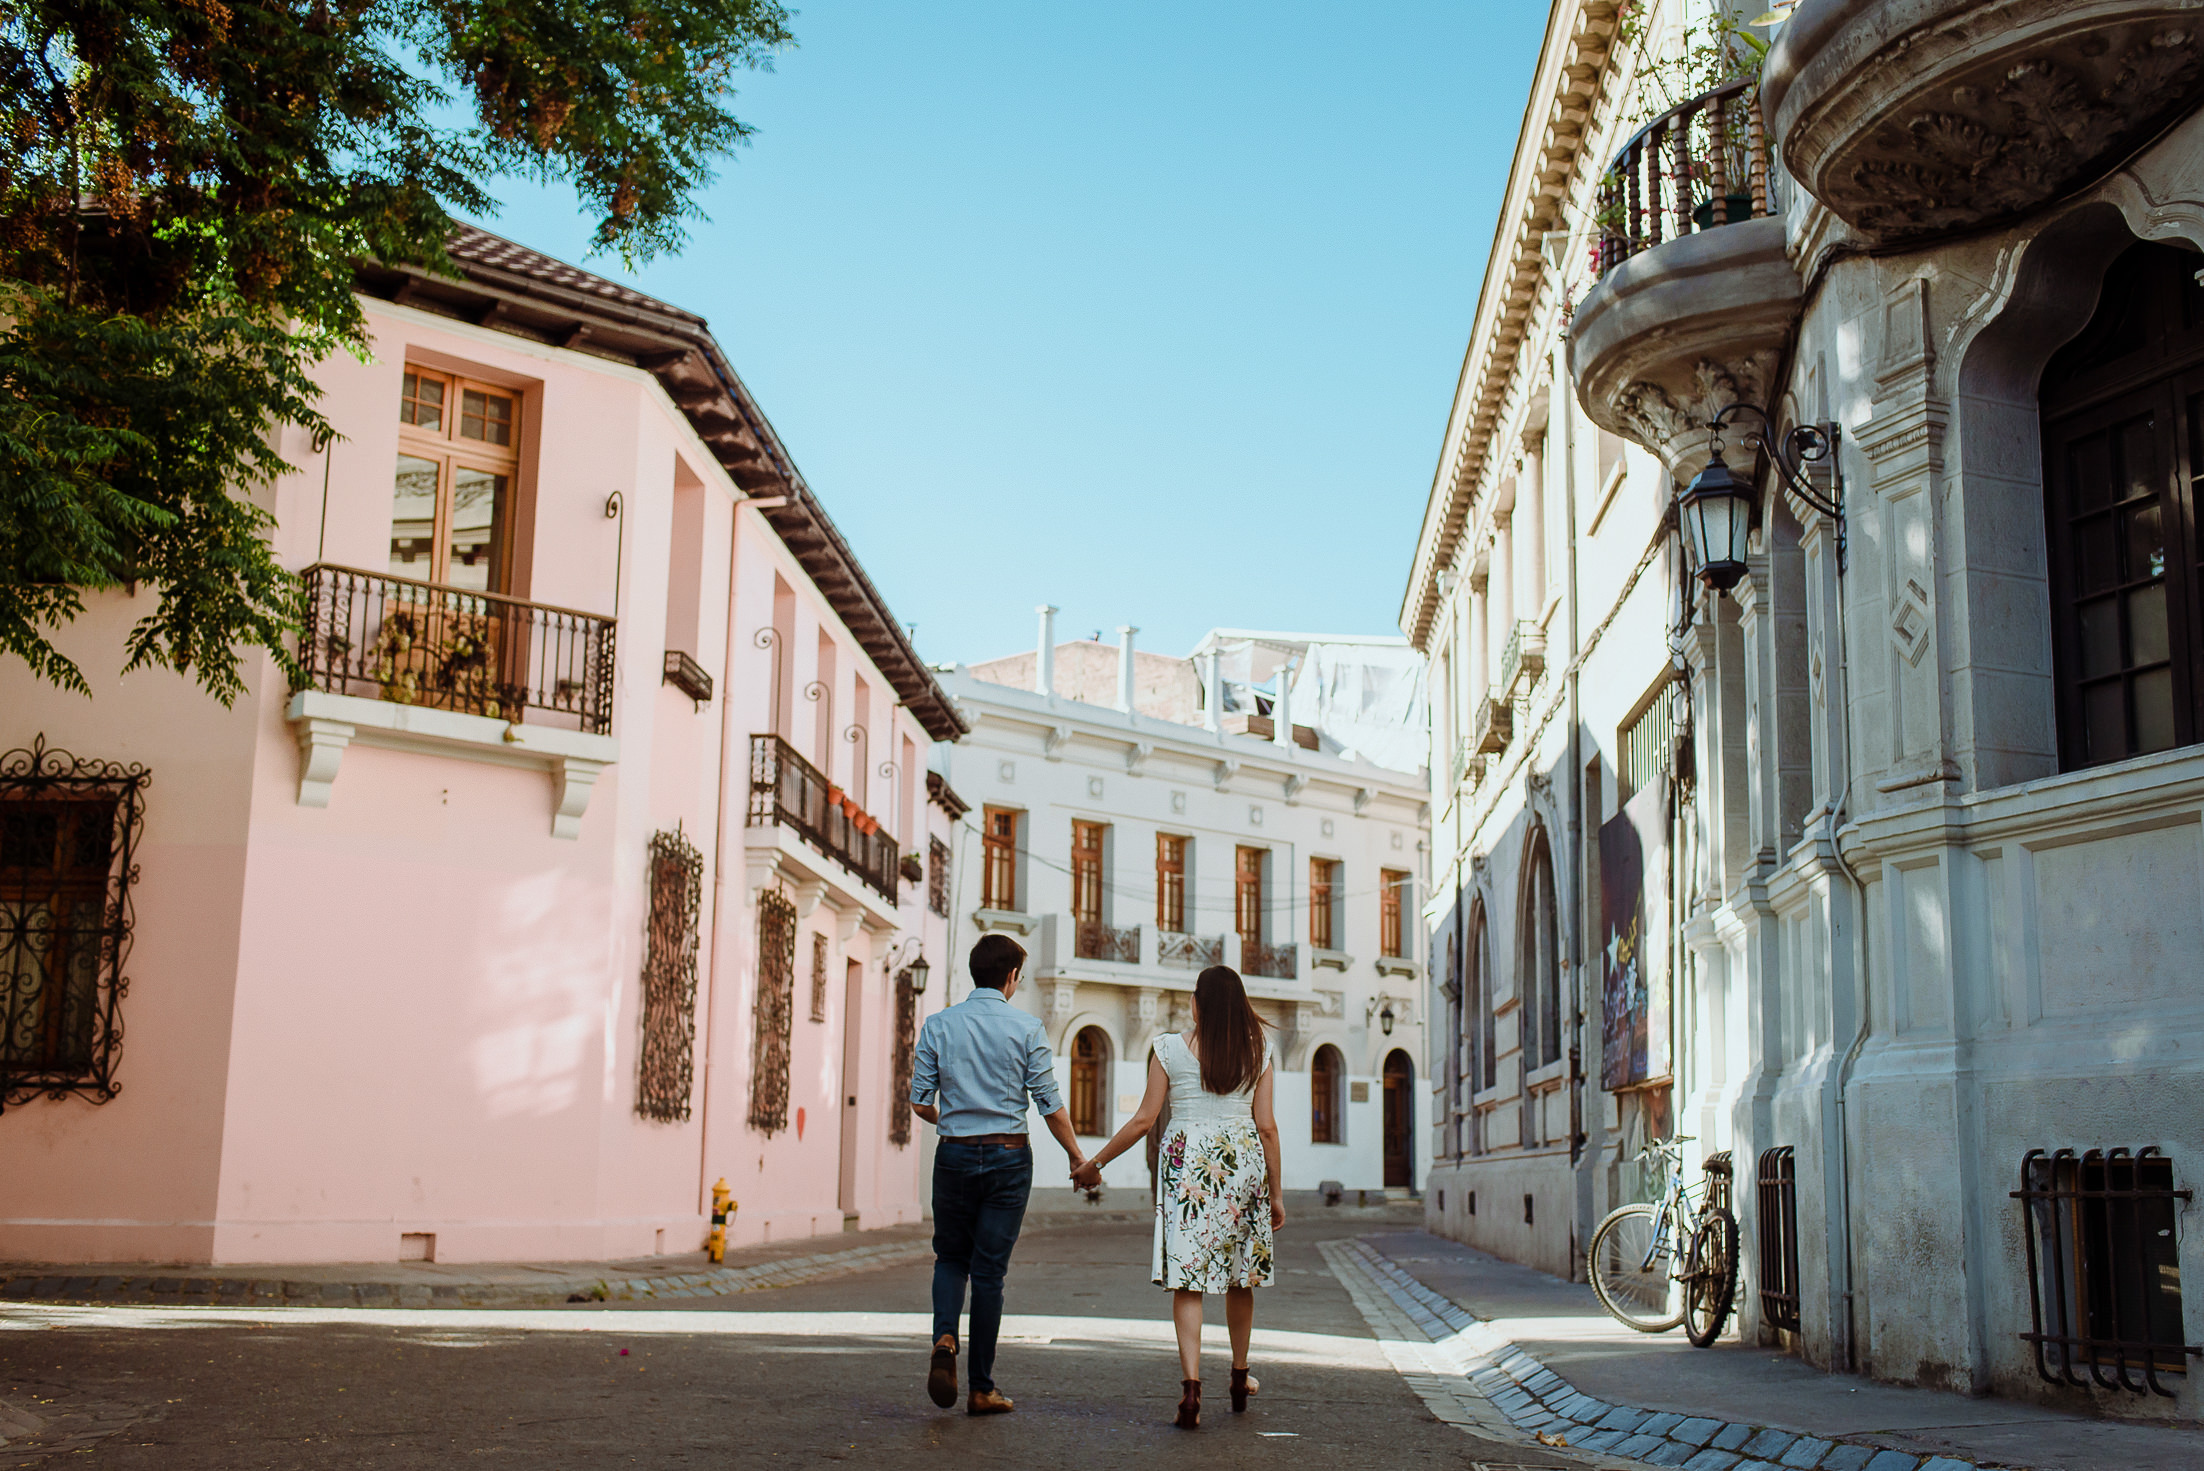 barrio-paris-londres-concha-y-toro-centro-santiago-calle-nueva-york-casco-antiguo-chile-sesion-preboda-deborah-dantzoff-fotografia-de-matrimonios